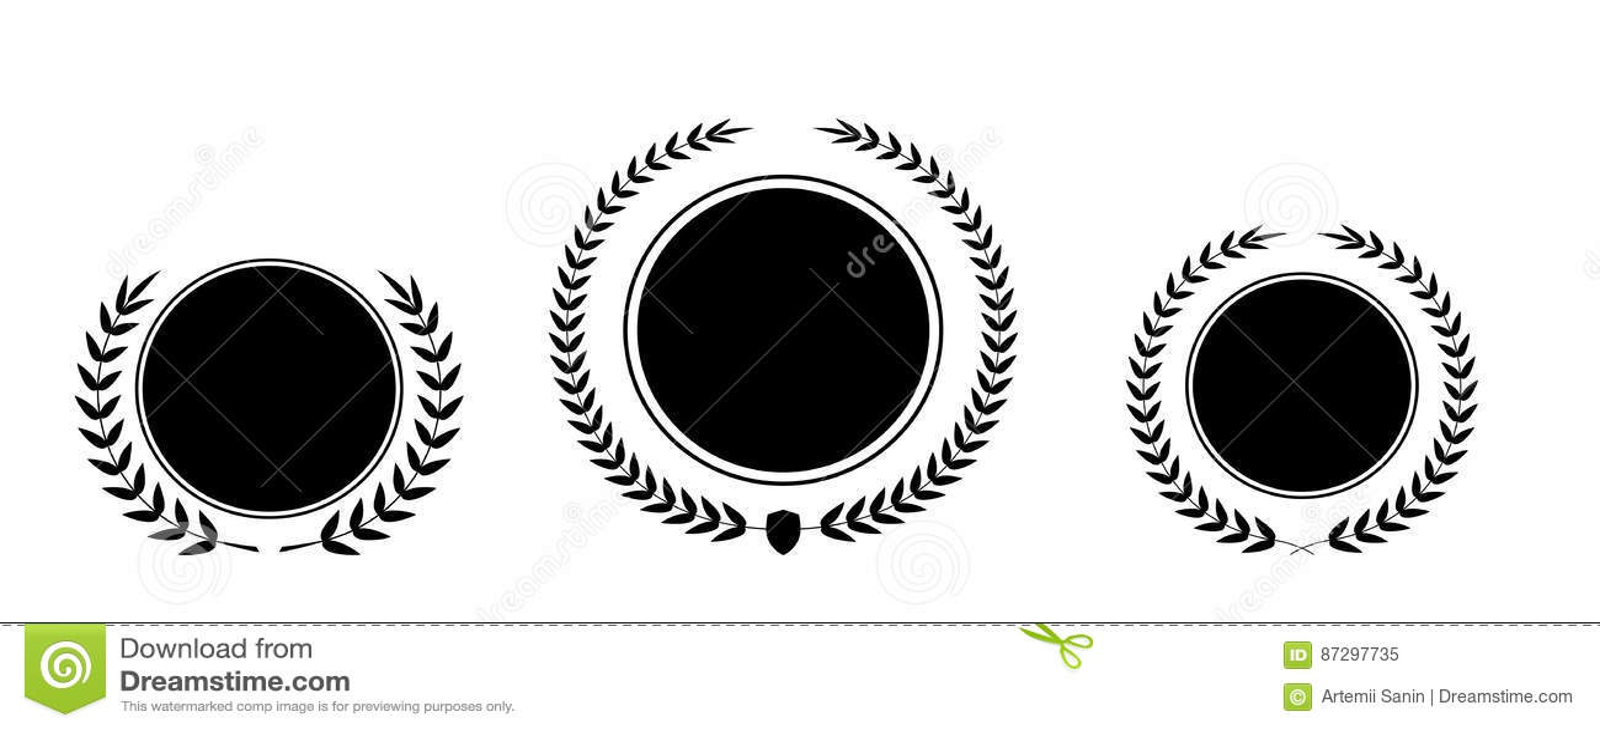 triumph stock illustrations  u2013 16 520 triumph stock